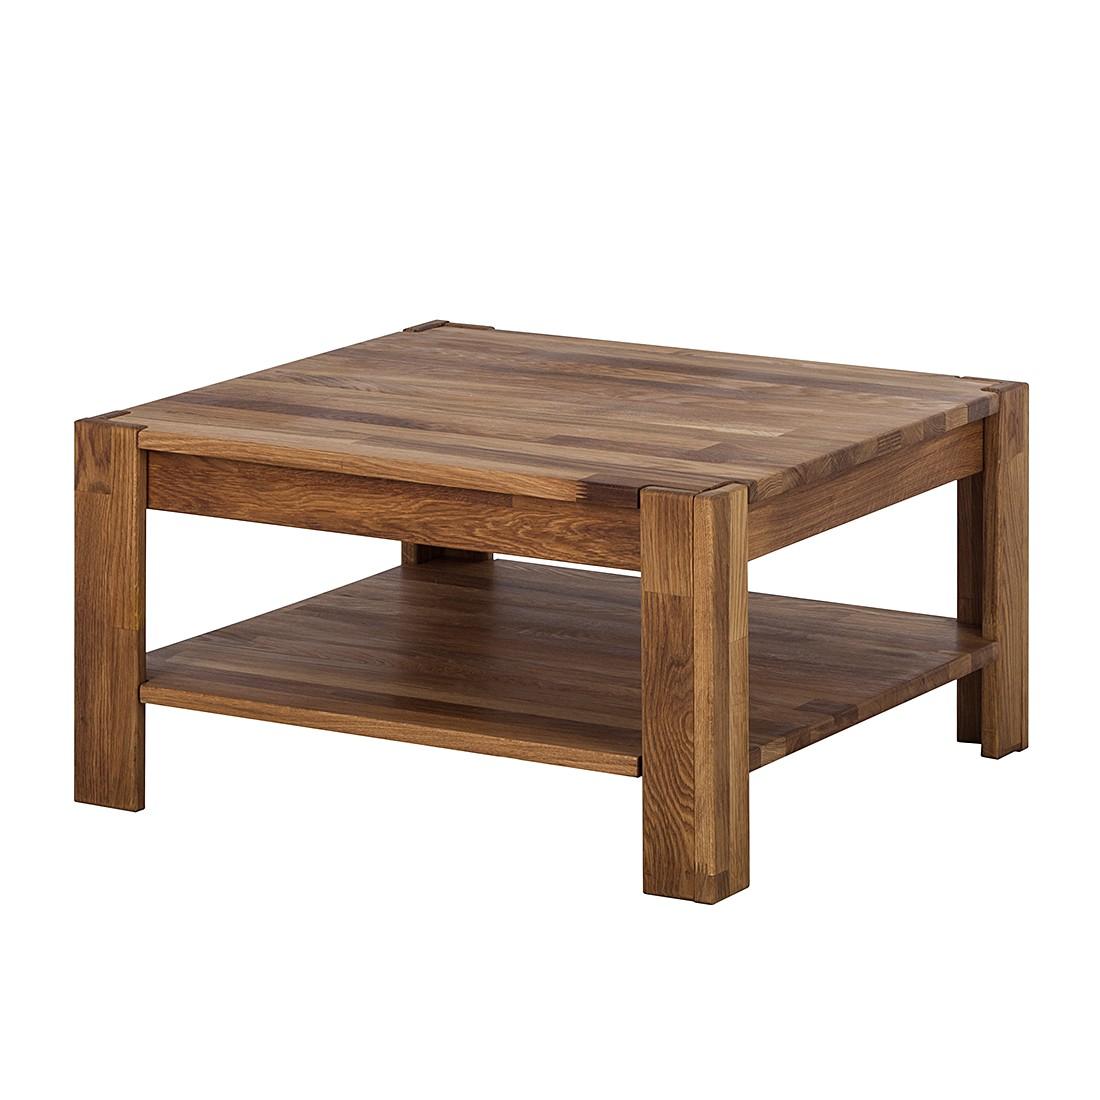 couchtisch kimwood eiche massiv ge lt ars natura g nstig. Black Bedroom Furniture Sets. Home Design Ideas